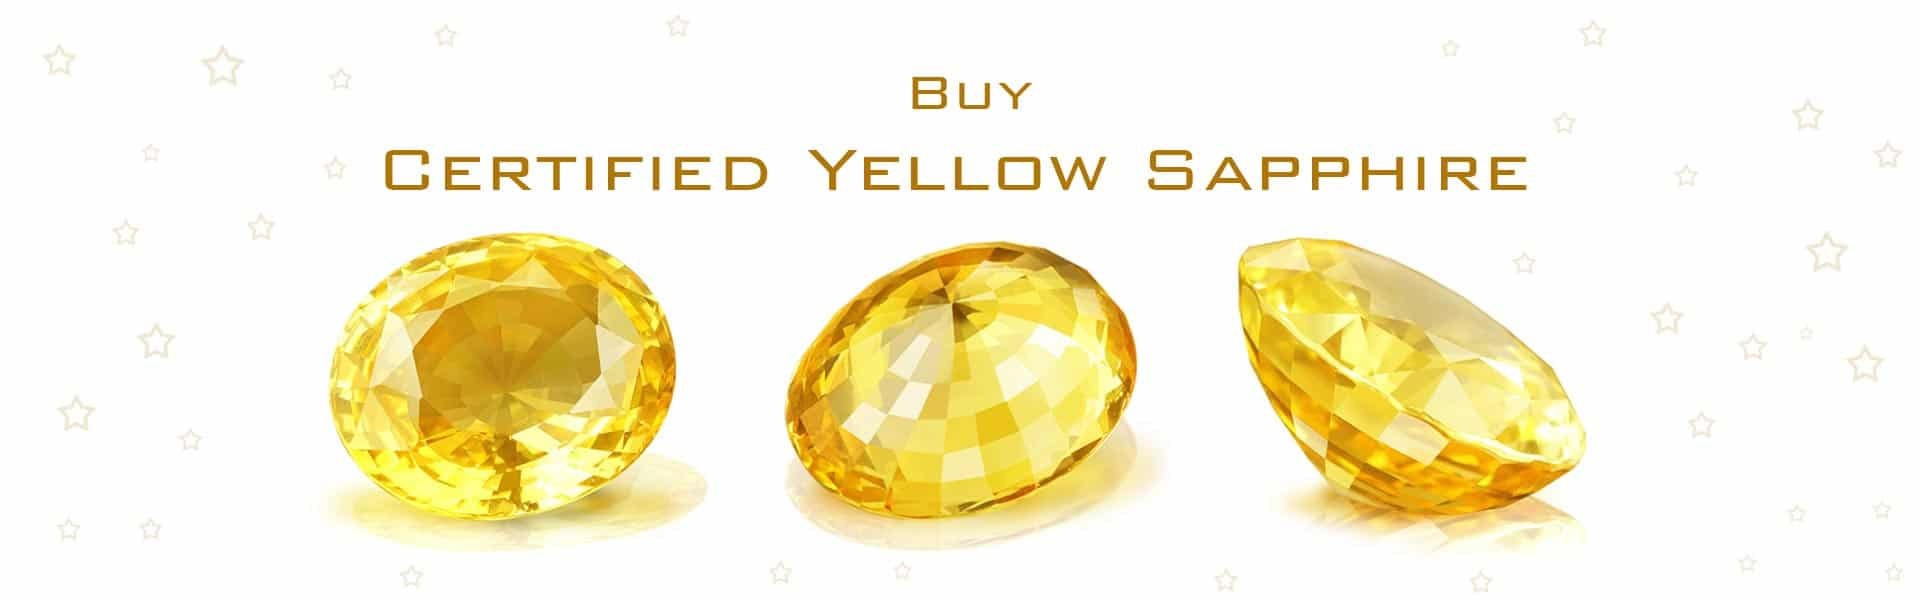 certified-yellow-sapphire